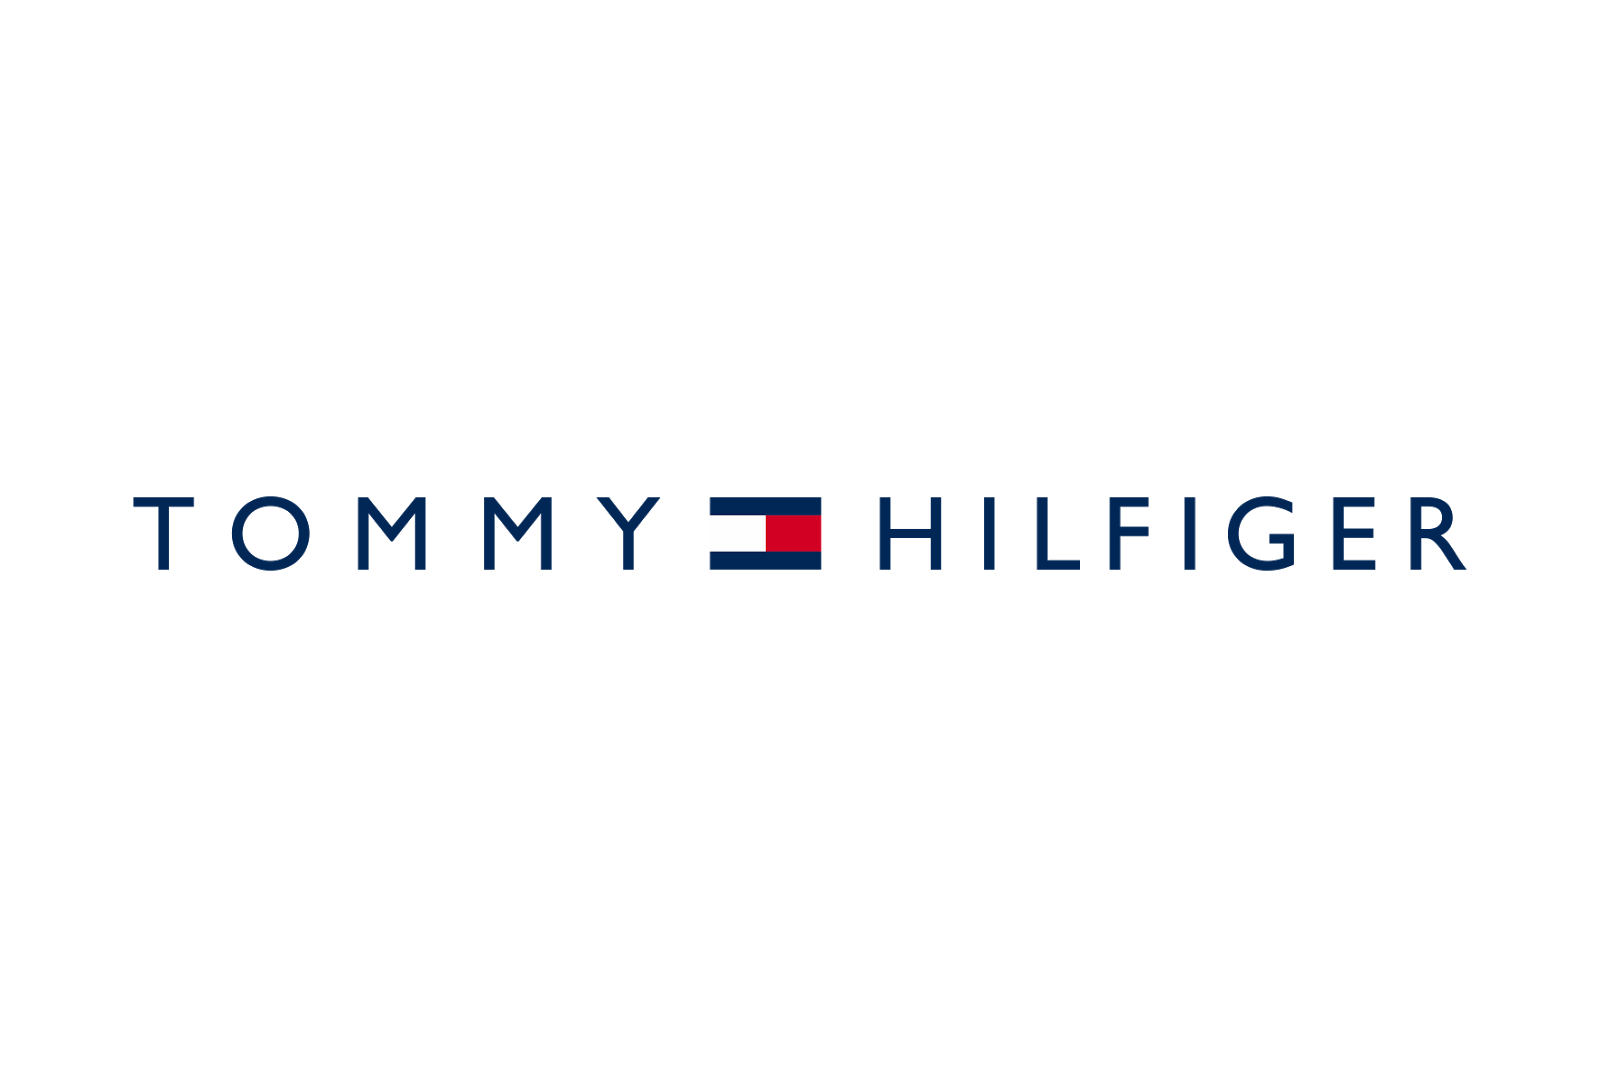 Tommy Hilfiger Iconic Fashion Logos